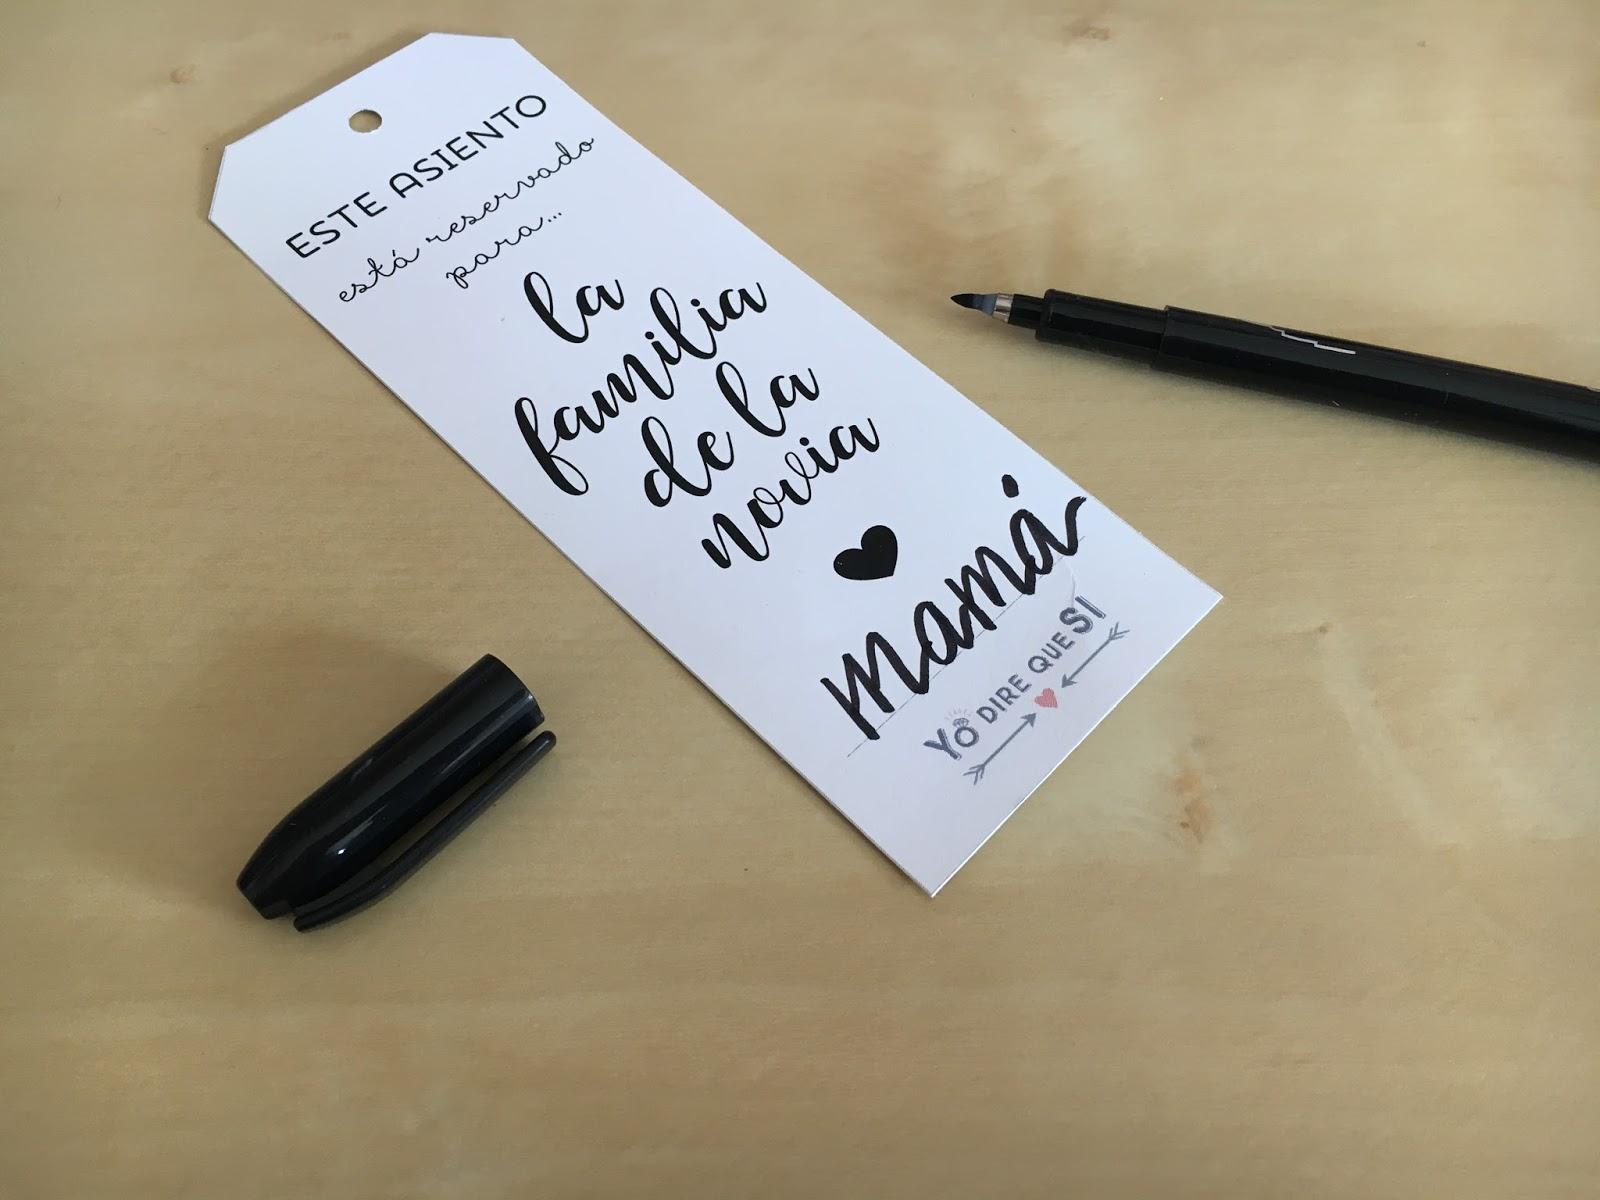 Blog de bodas - Yo dire que si: Etiquetas para reservar asientos ...